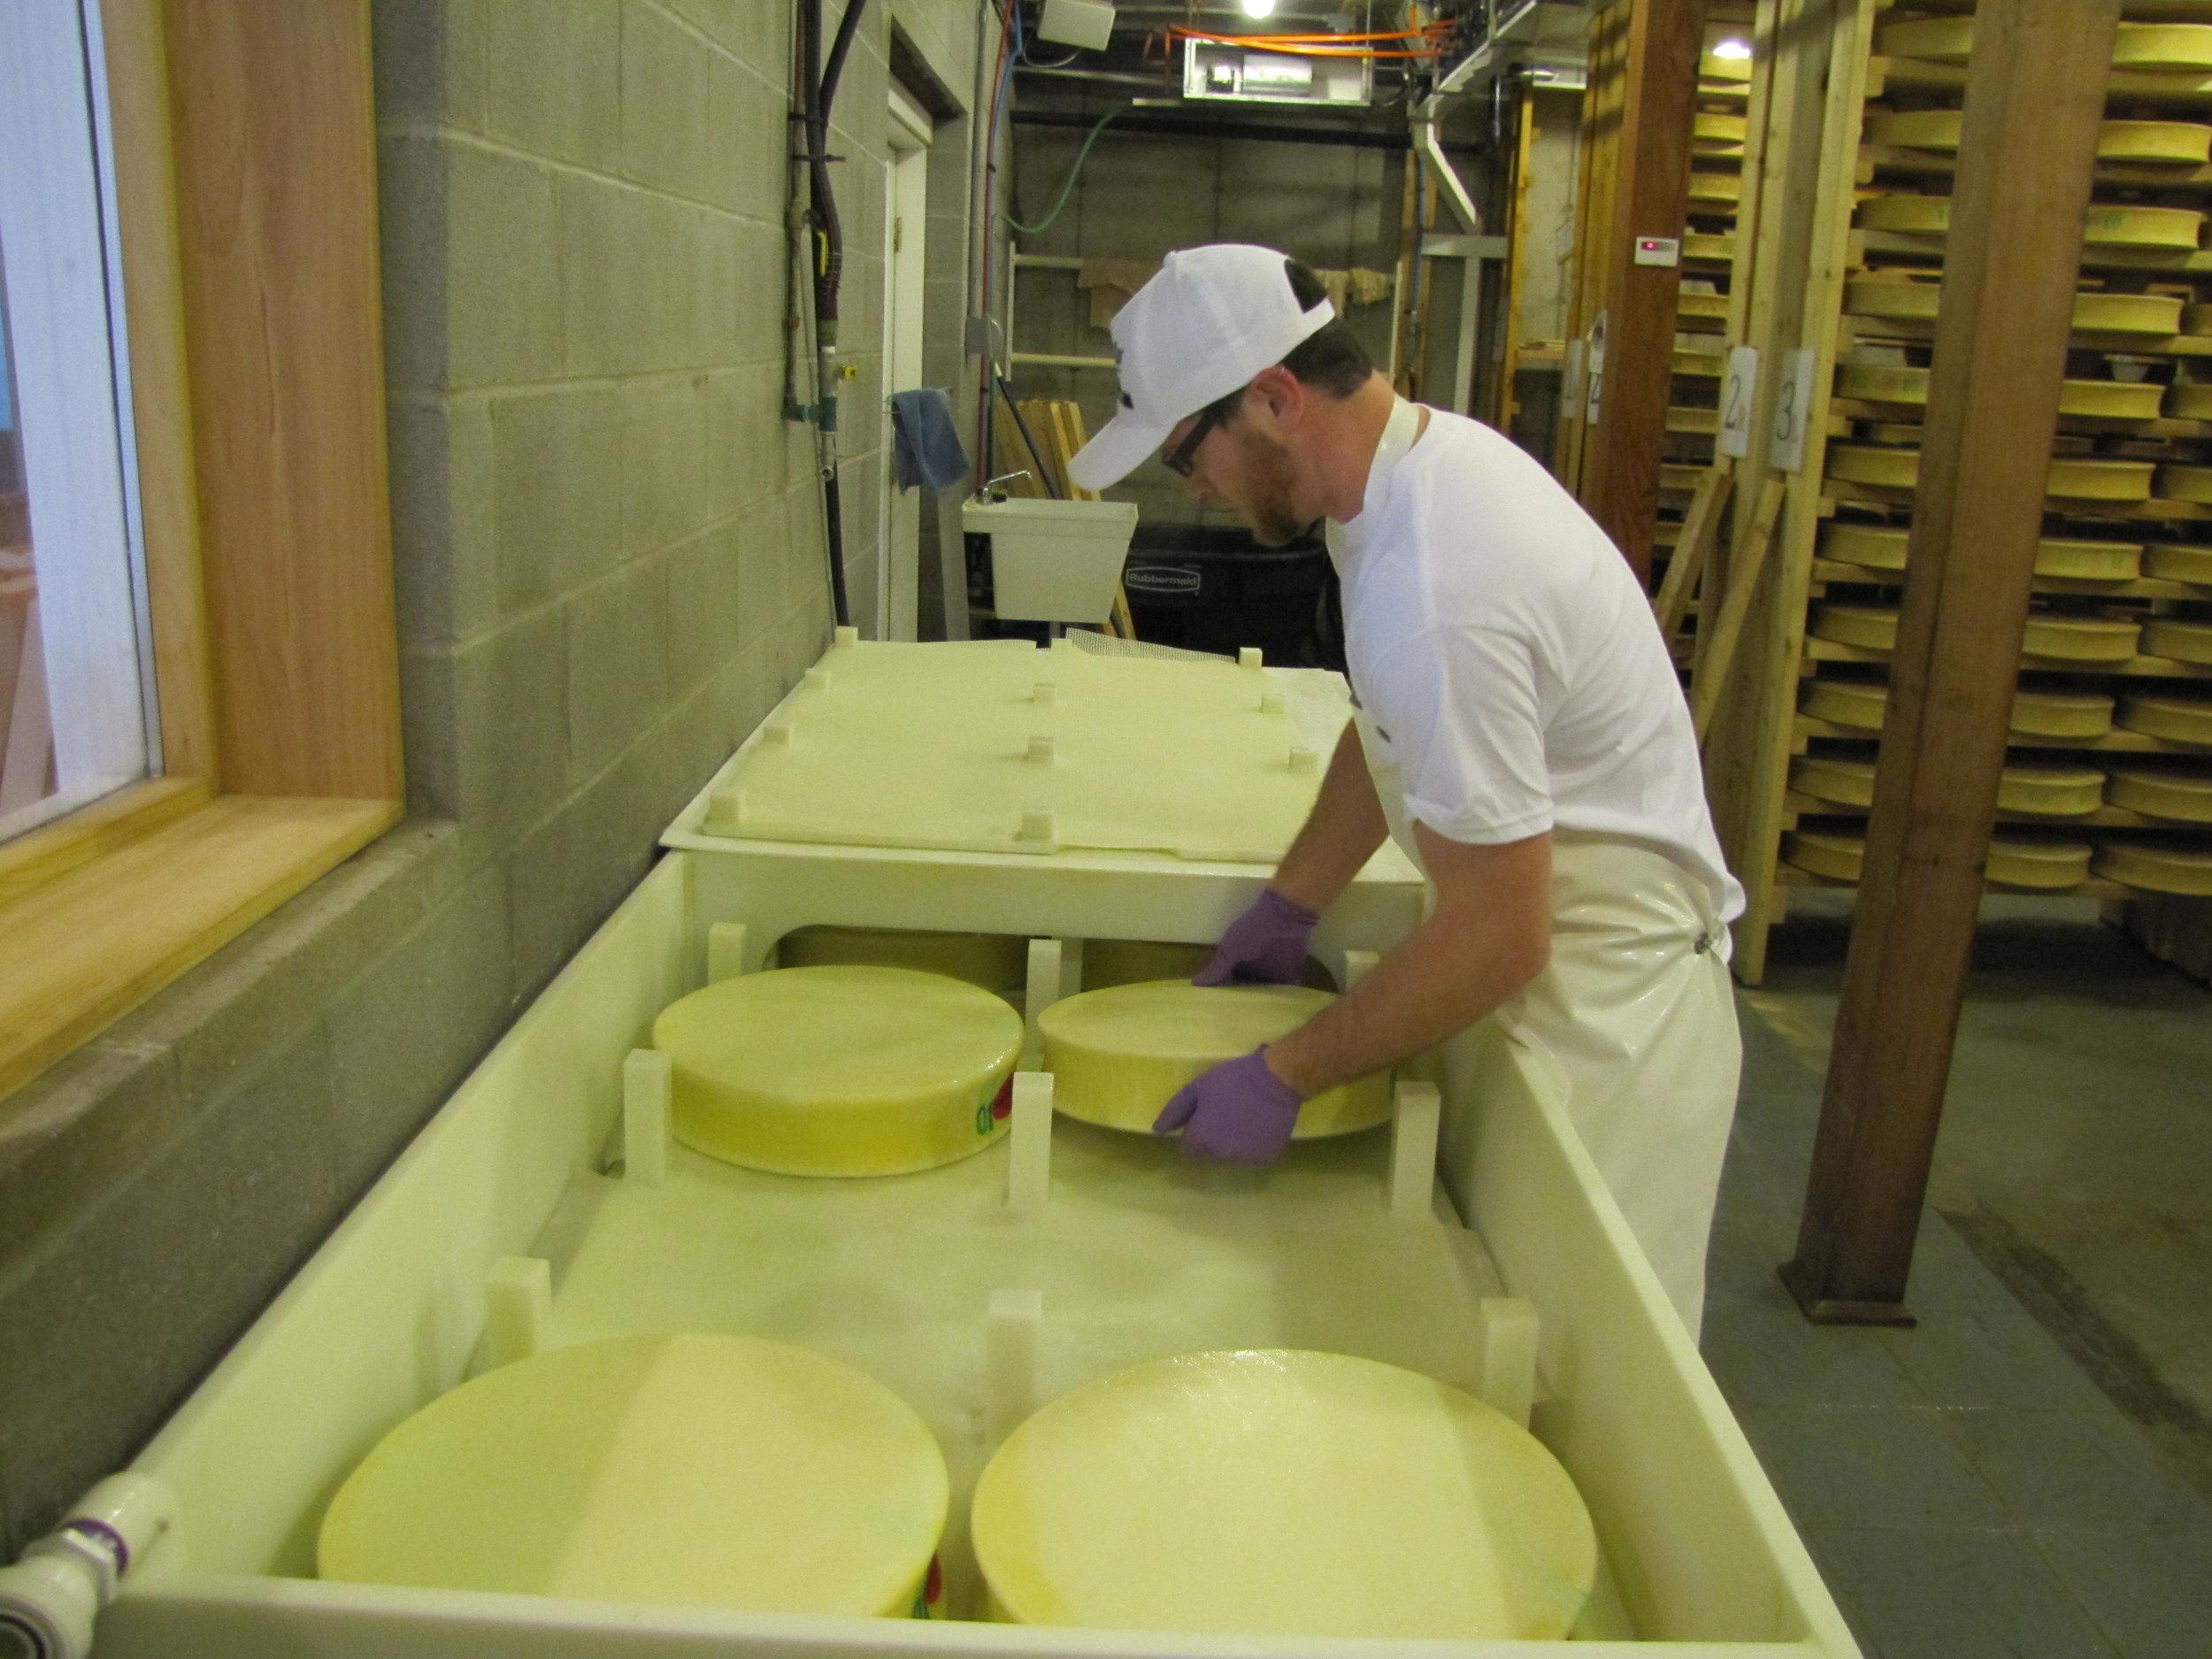 Brining the Cheese